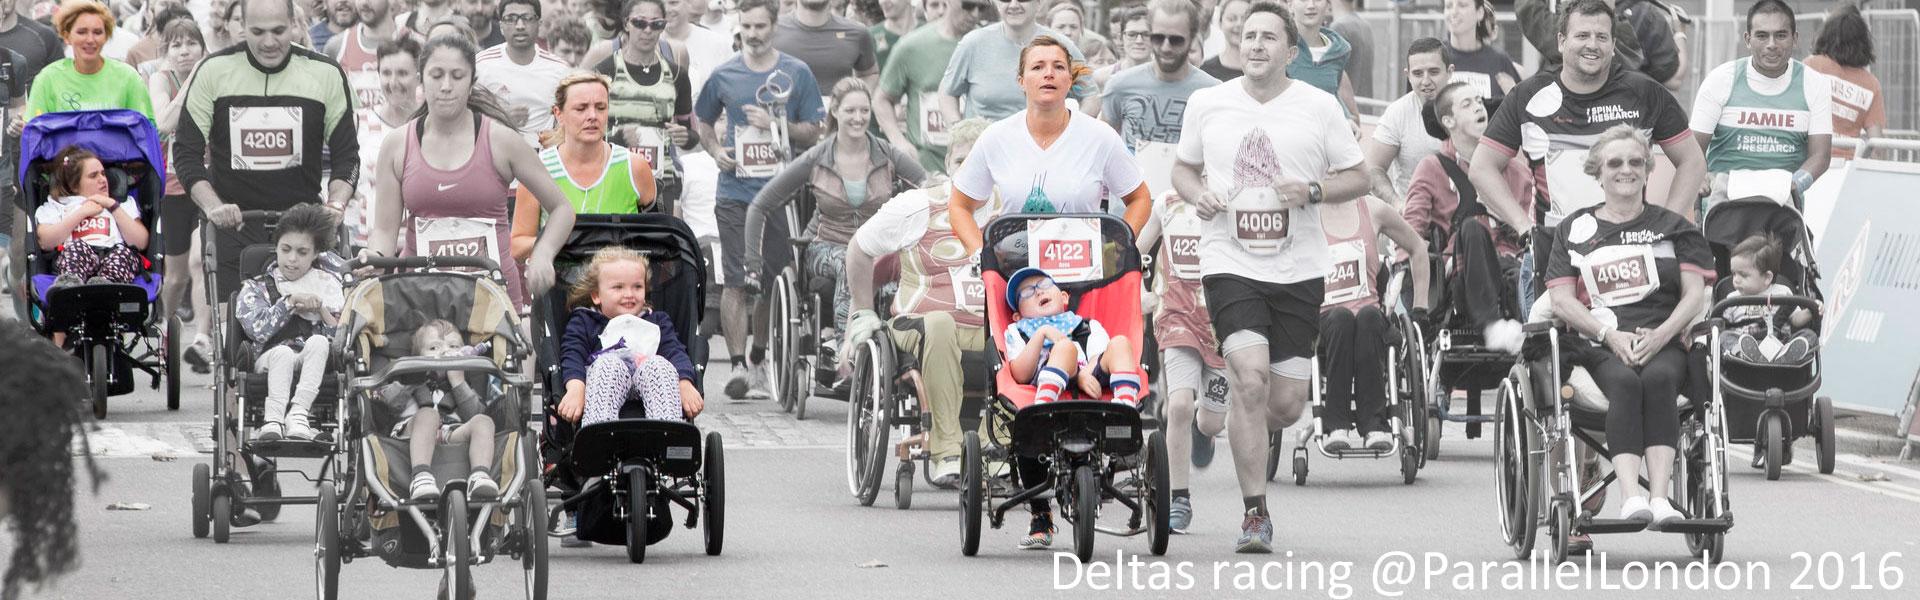 3 Delta Buggies running in Parallel London event 2016